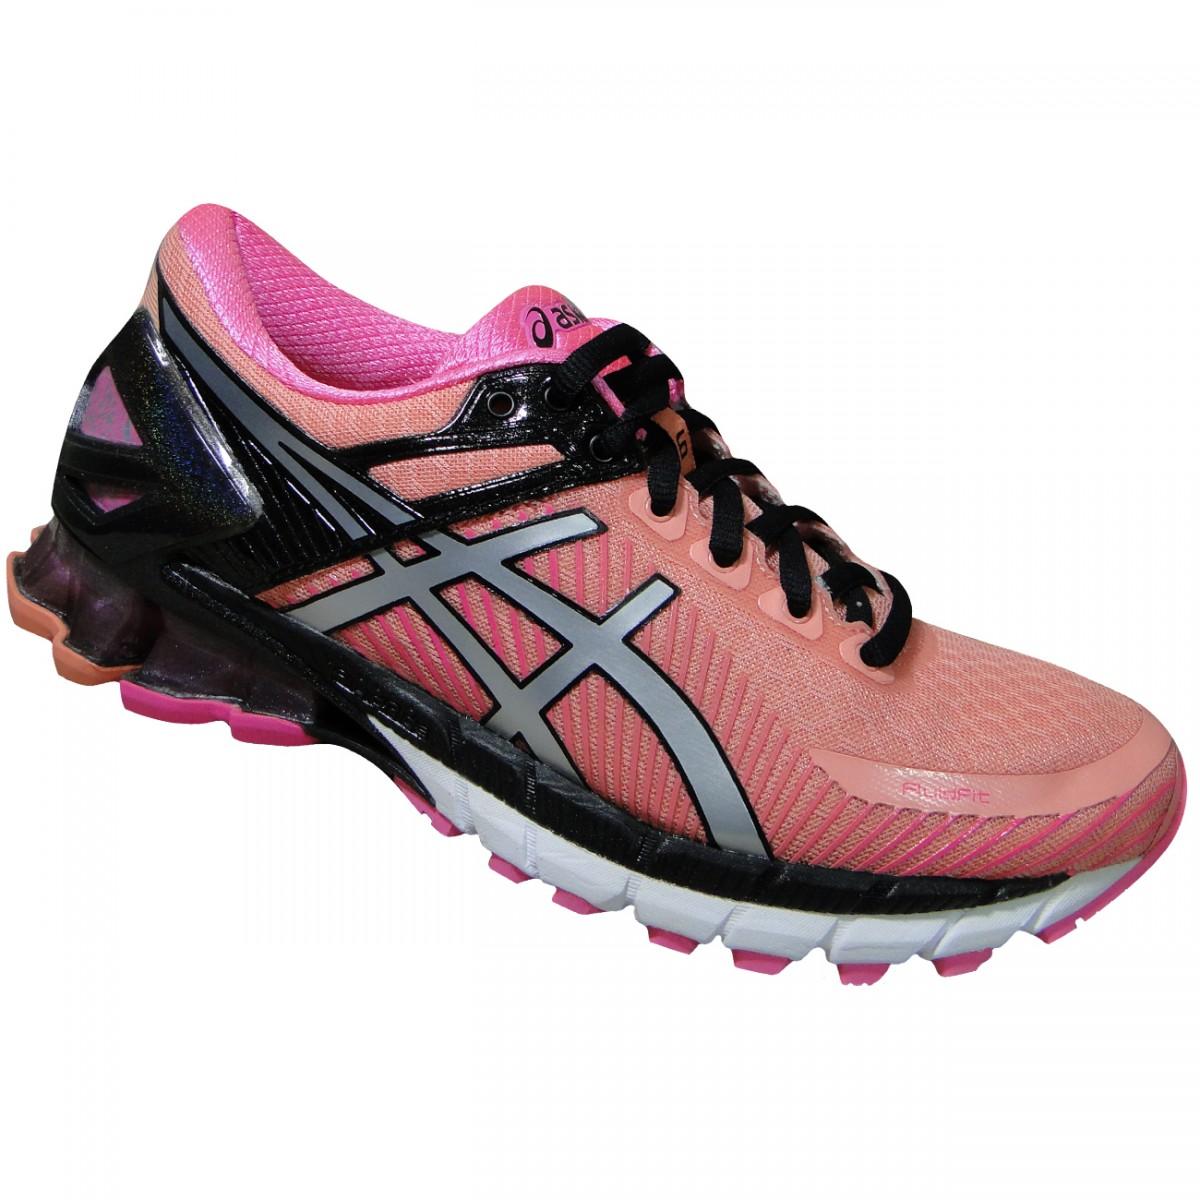 c9a4f8b588d Tenis Asics Gel-Kinsei 6 T692N 7693 - Coral Preto Pink - Chuteira Nike